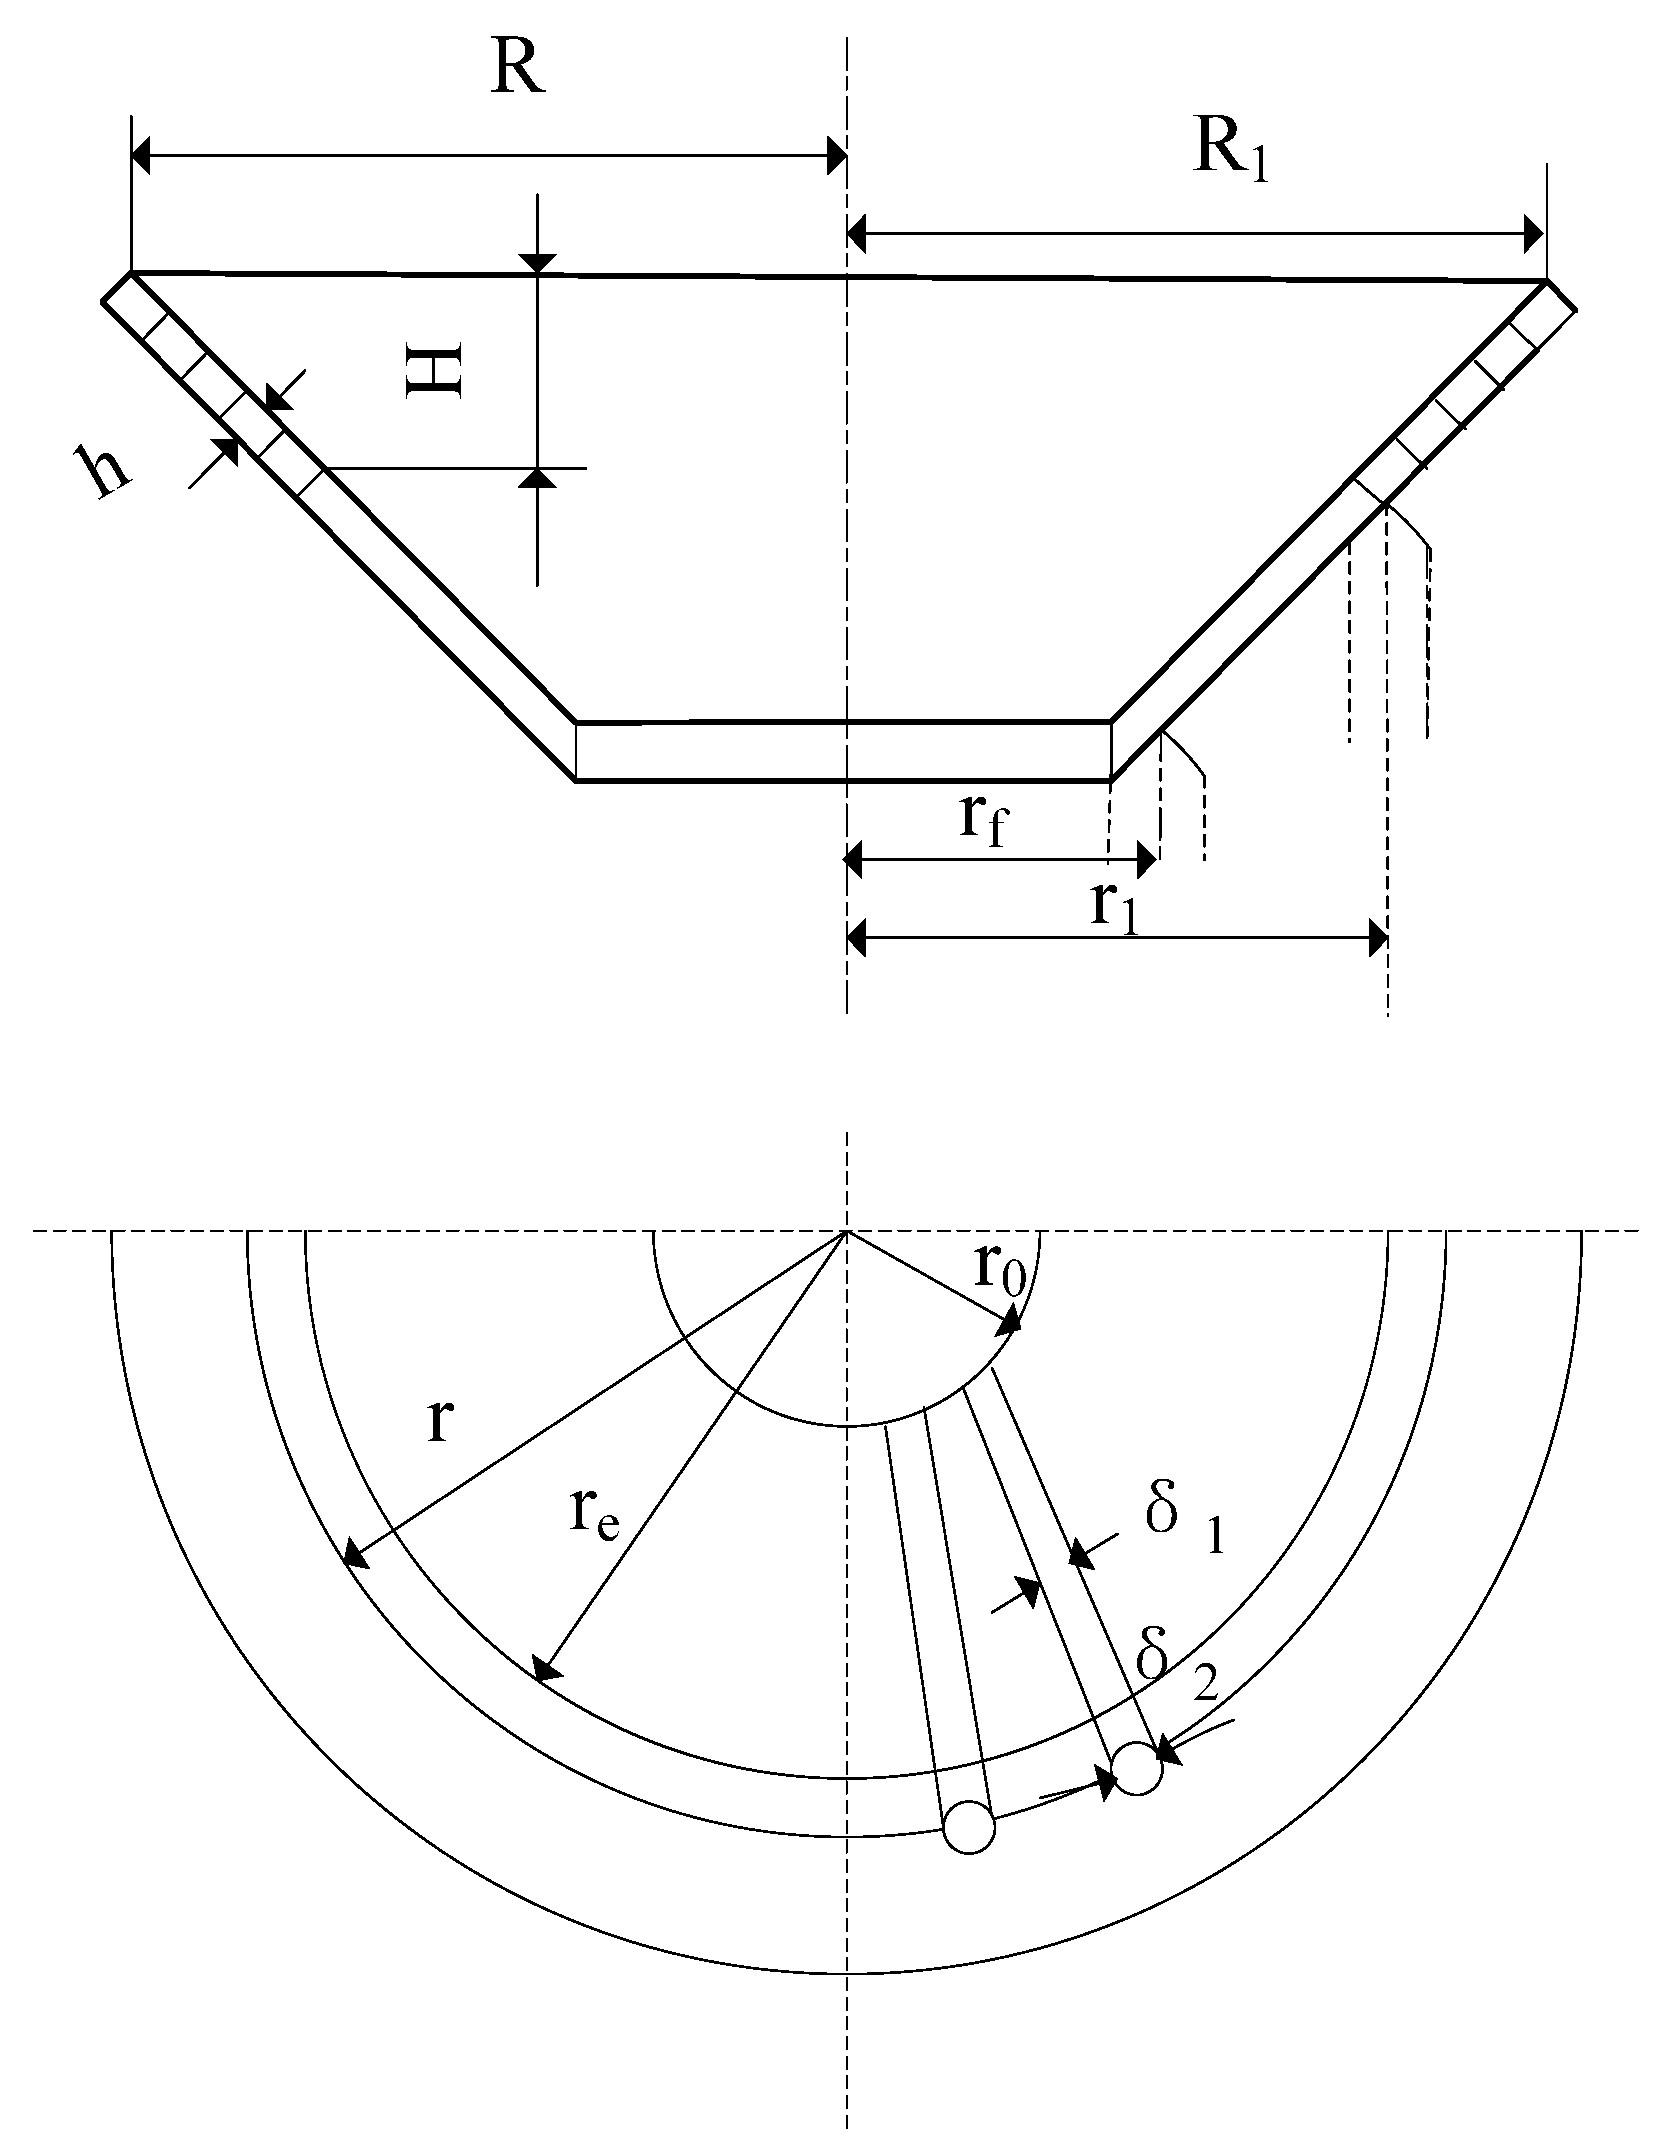 Diaphragm Clutch Diagram Mca Free Full Text Of Diaphragm Clutch Diagram